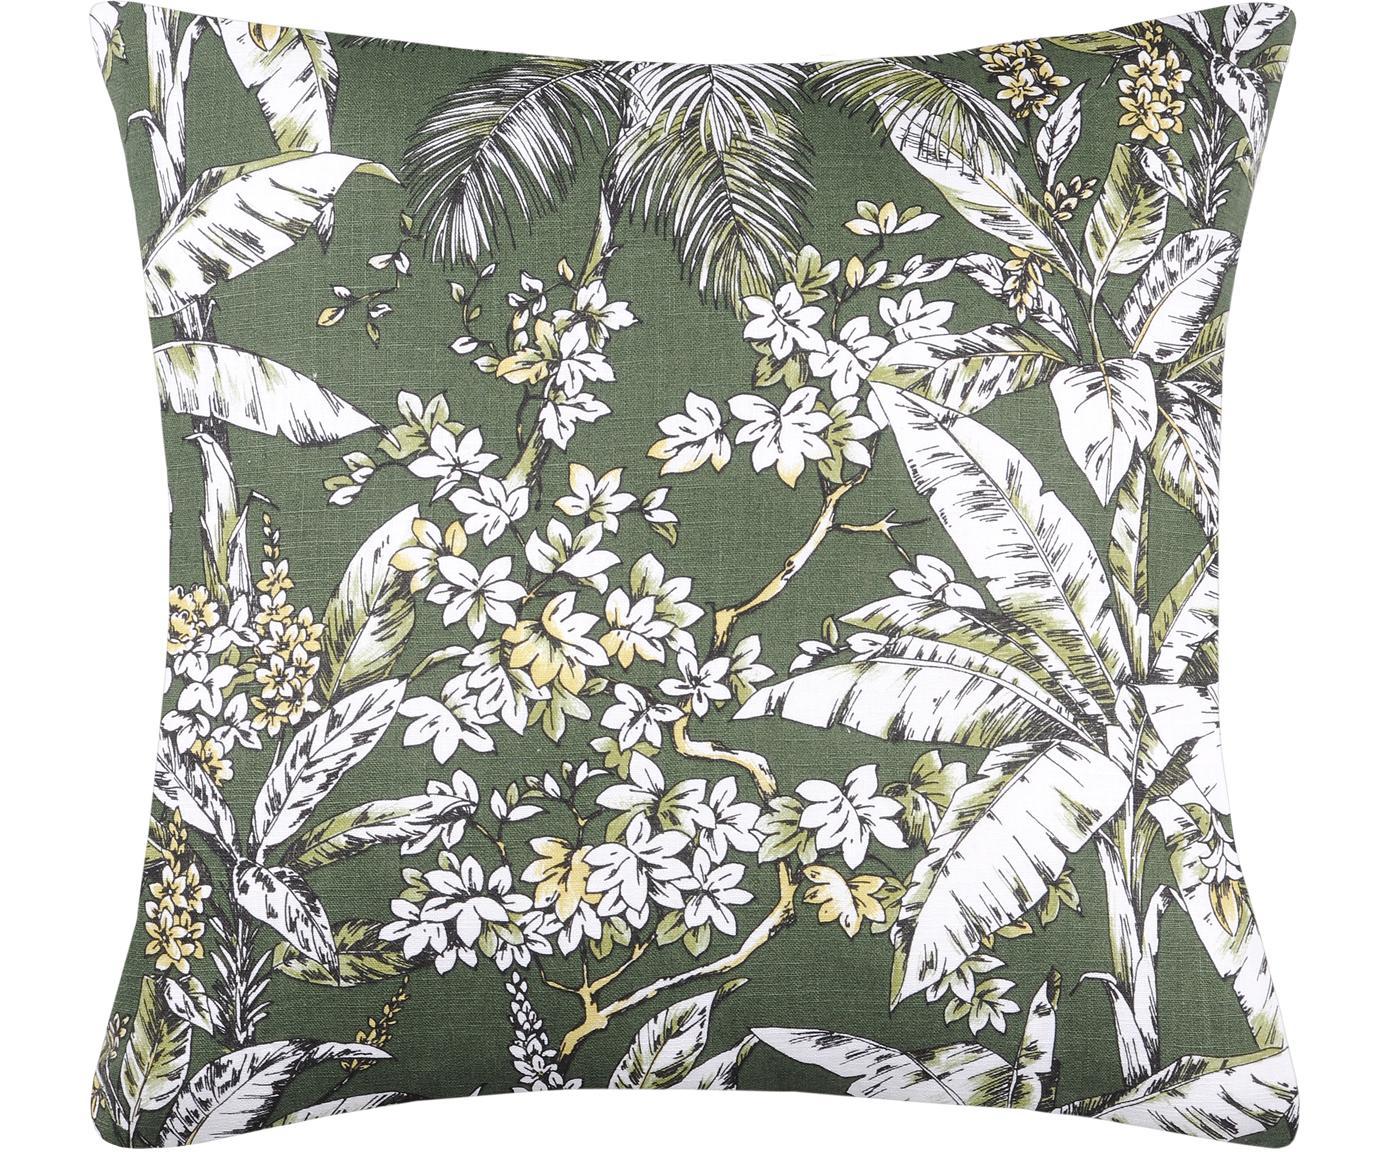 Cuscino con imbottitura e motivo floreale Barbade, 50% poliestere, 46% fibre di ramie, 4% cotone, Cachi, Larg. 50 x Lung. 50 cm